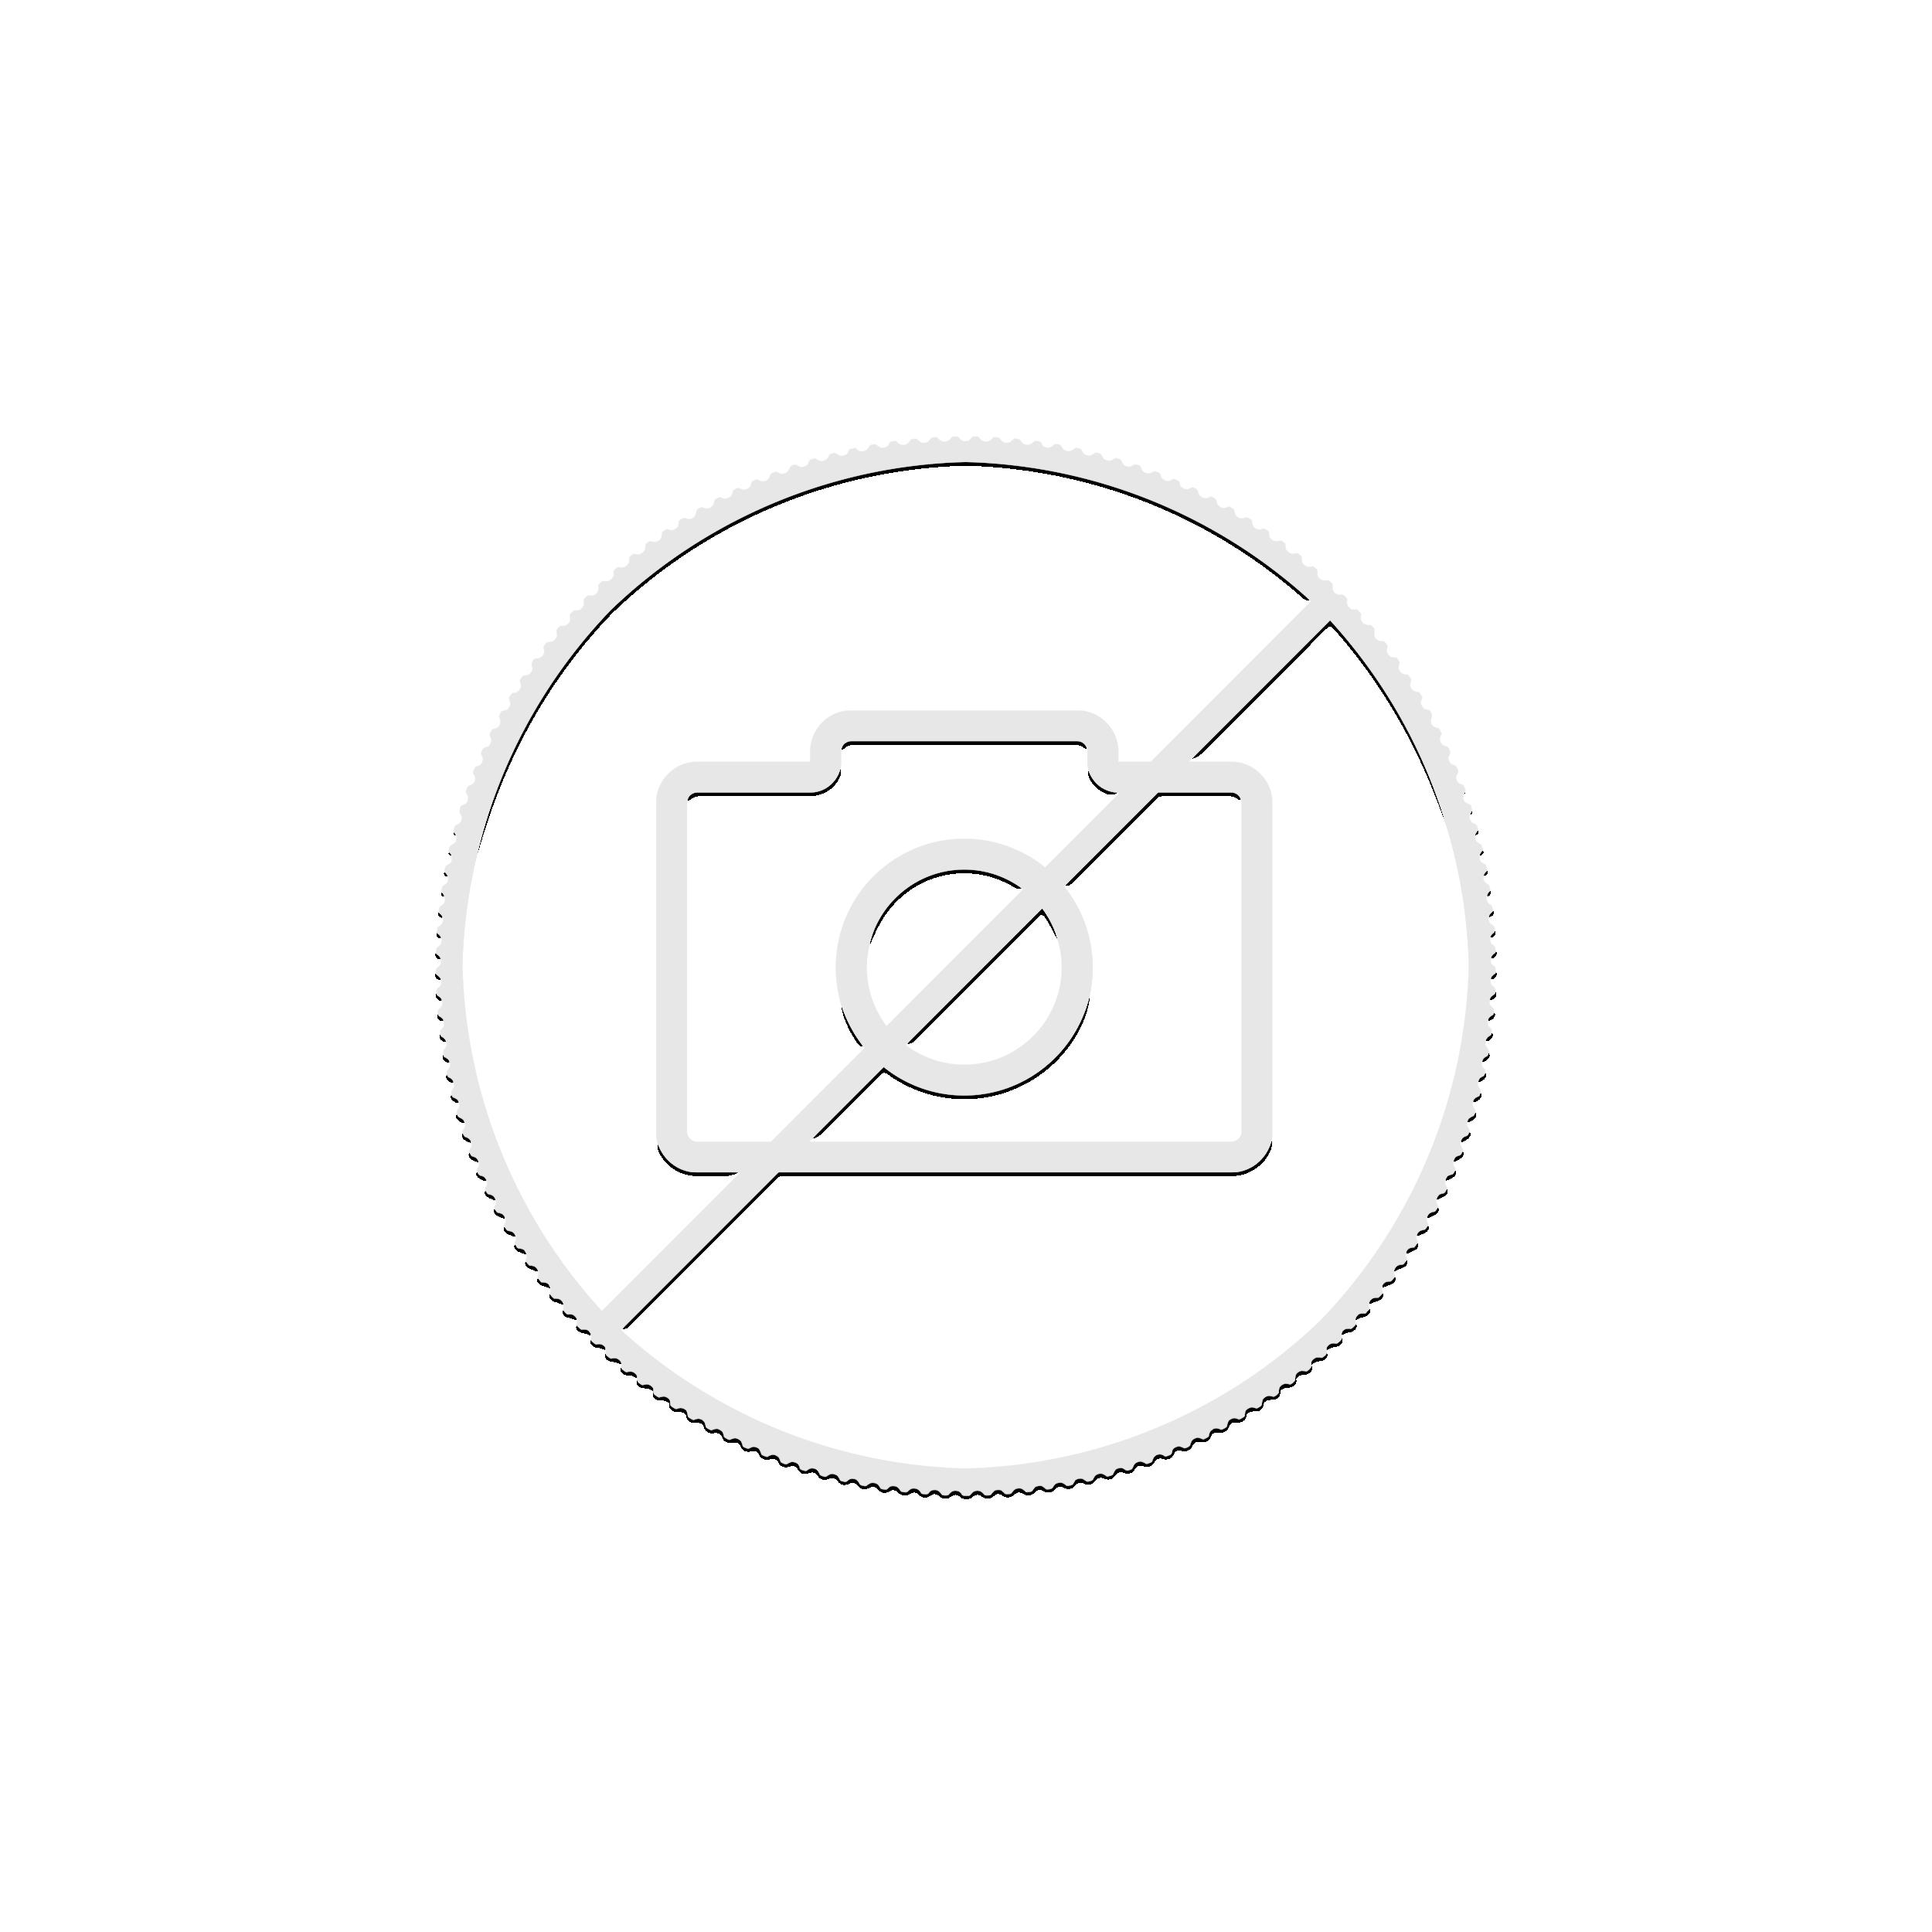 3 Troy ounce zilveren munt Mandala art IV 'Moresque'